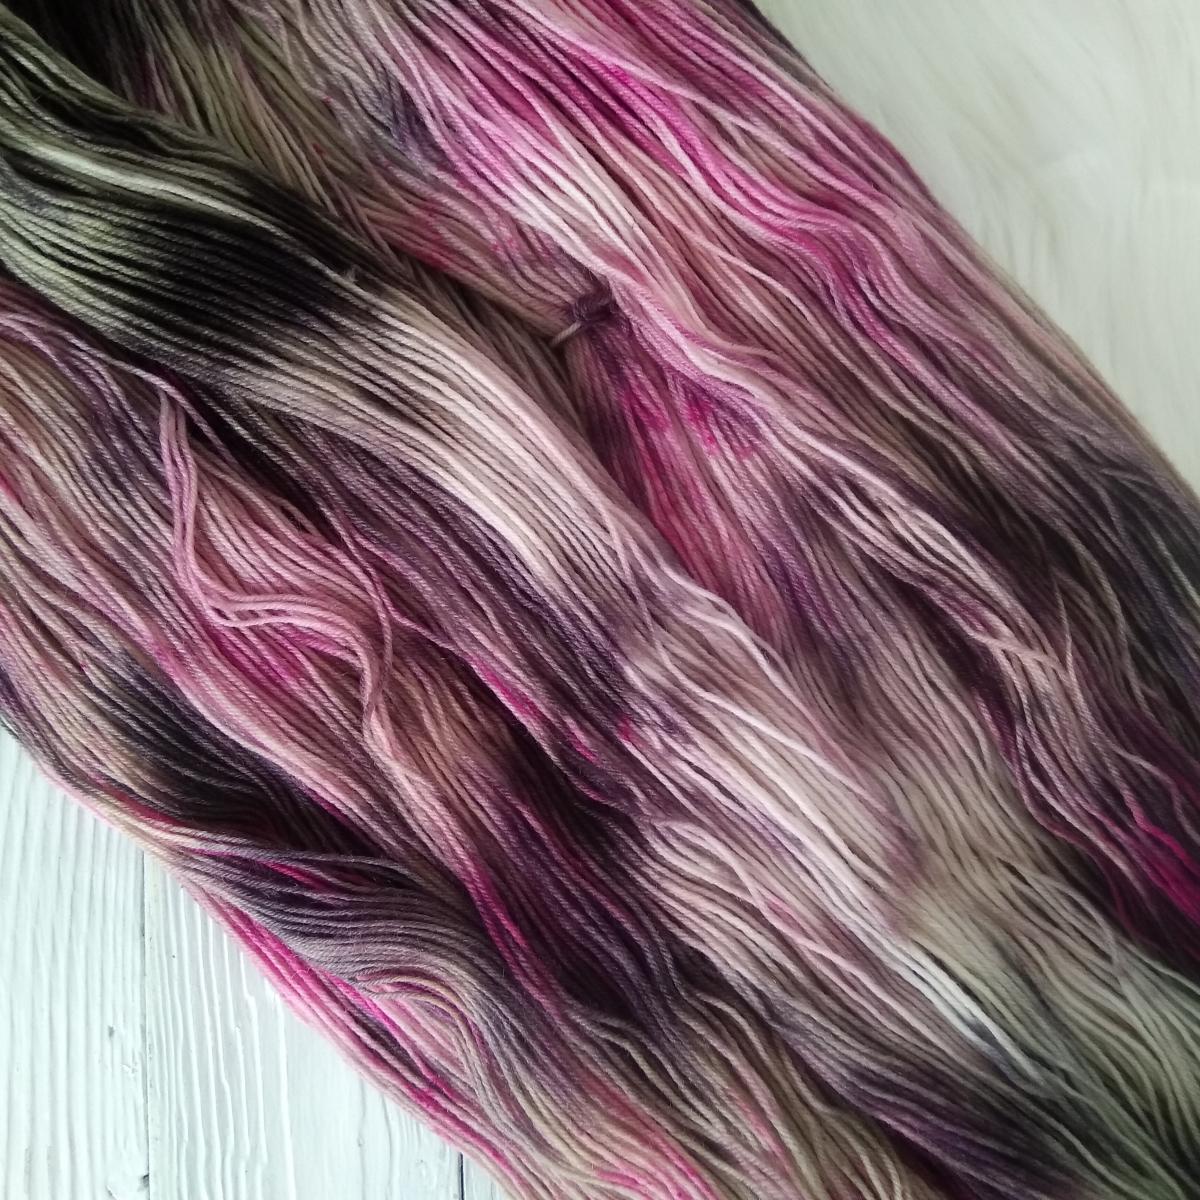 woodico.pro hand dyed yarn 037 3 1200x1200 - Hand dyed yarn / 037